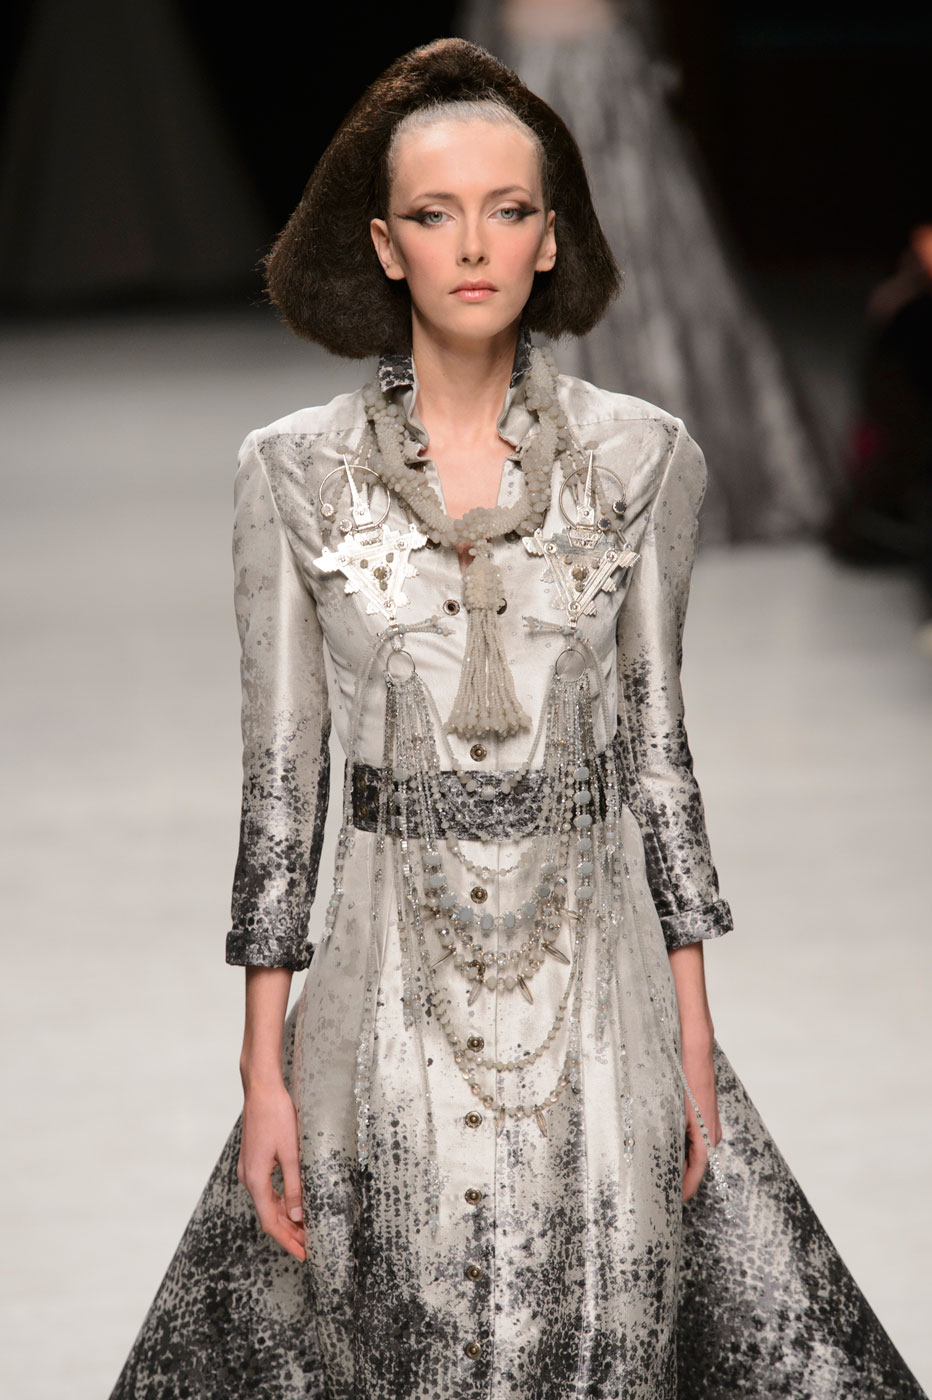 Julien-Fournie-Prive-fashion-runway-show-haute-couture-paris-spring-2015-the-impression-35